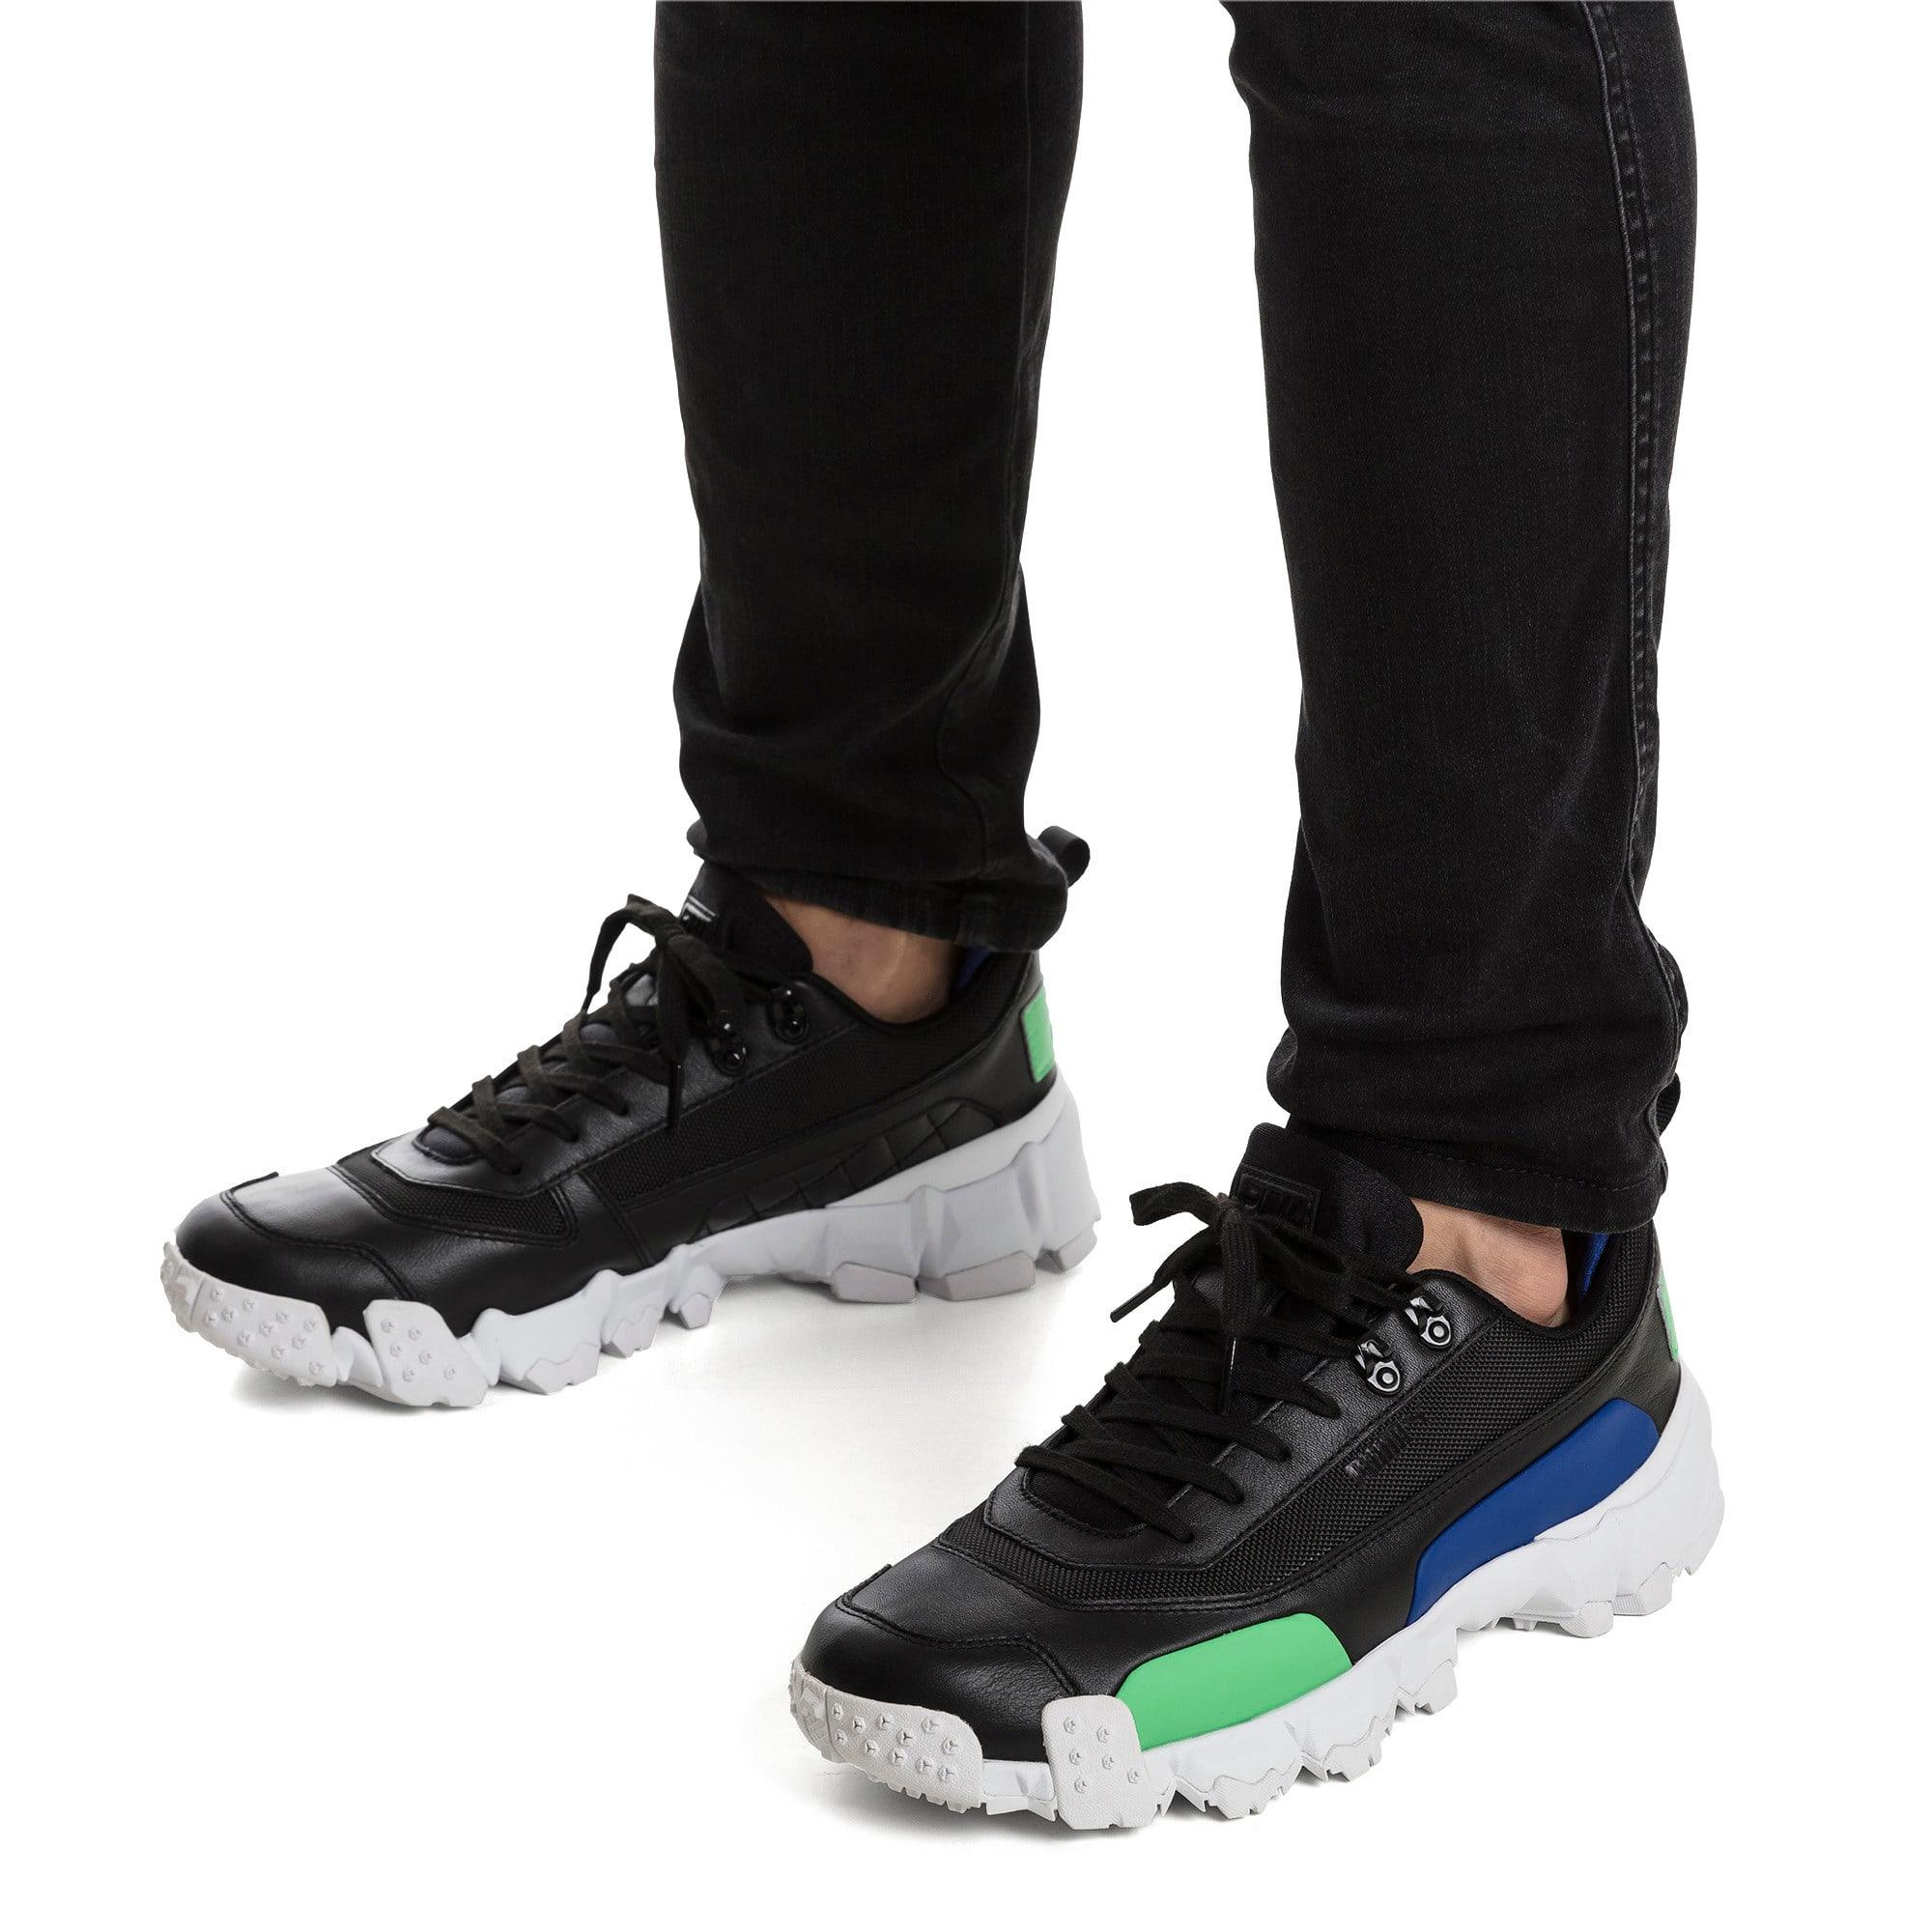 Thumbnail 2 of Trailfox Leather Sneakers, Puma Black-Irish Green, medium